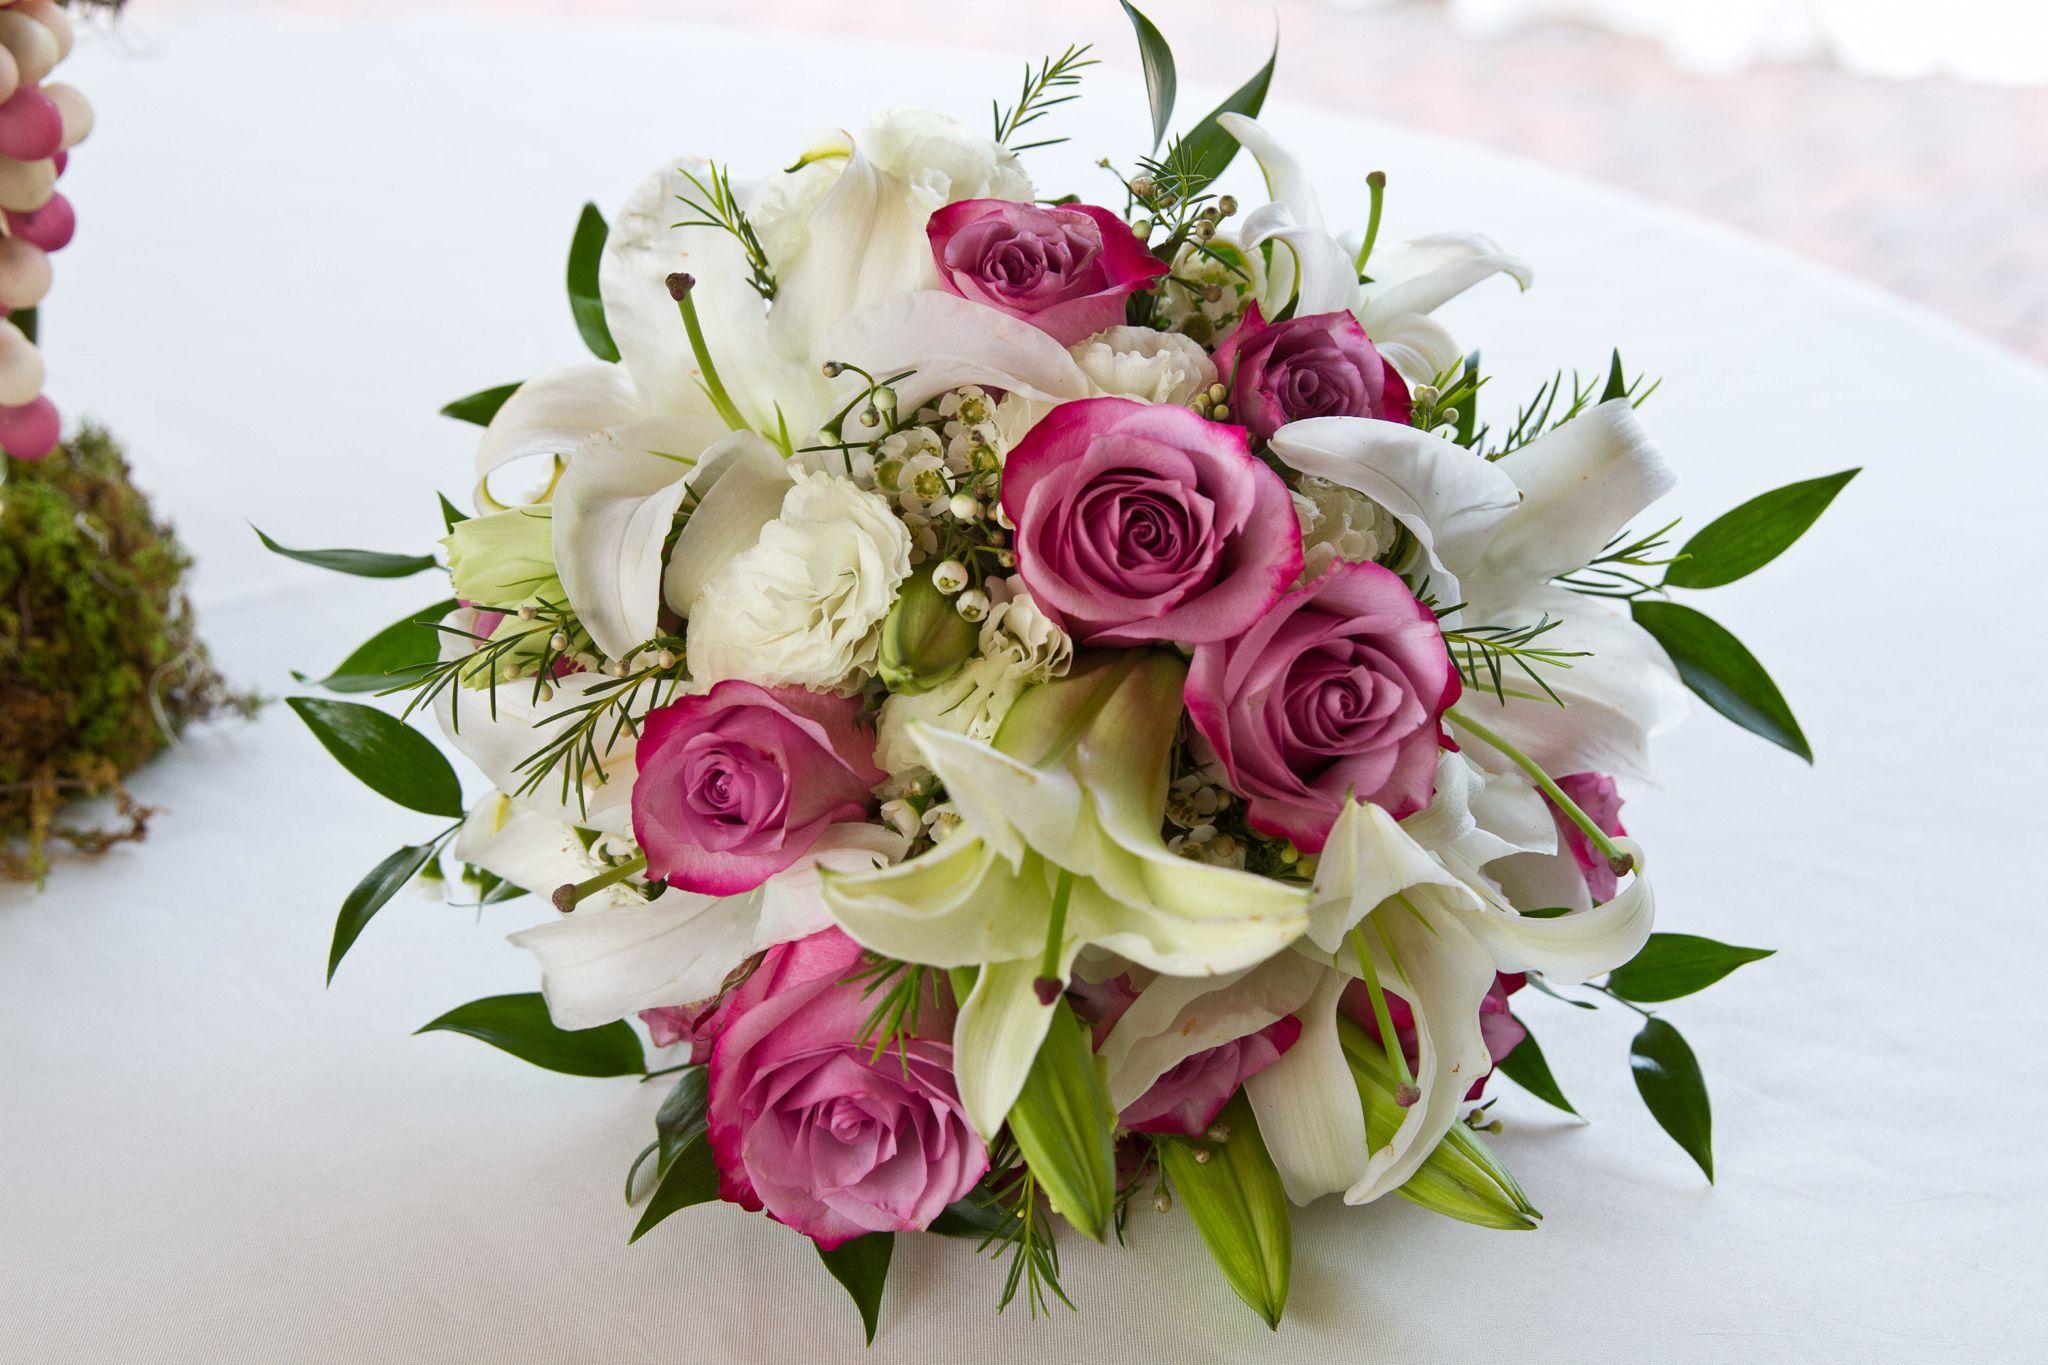 Wedding Flowers Paducah Kentucky Rose Garden Florist Lavender Wedding  Flowers Paducah Kentucky Rose Garden Florist Lavender